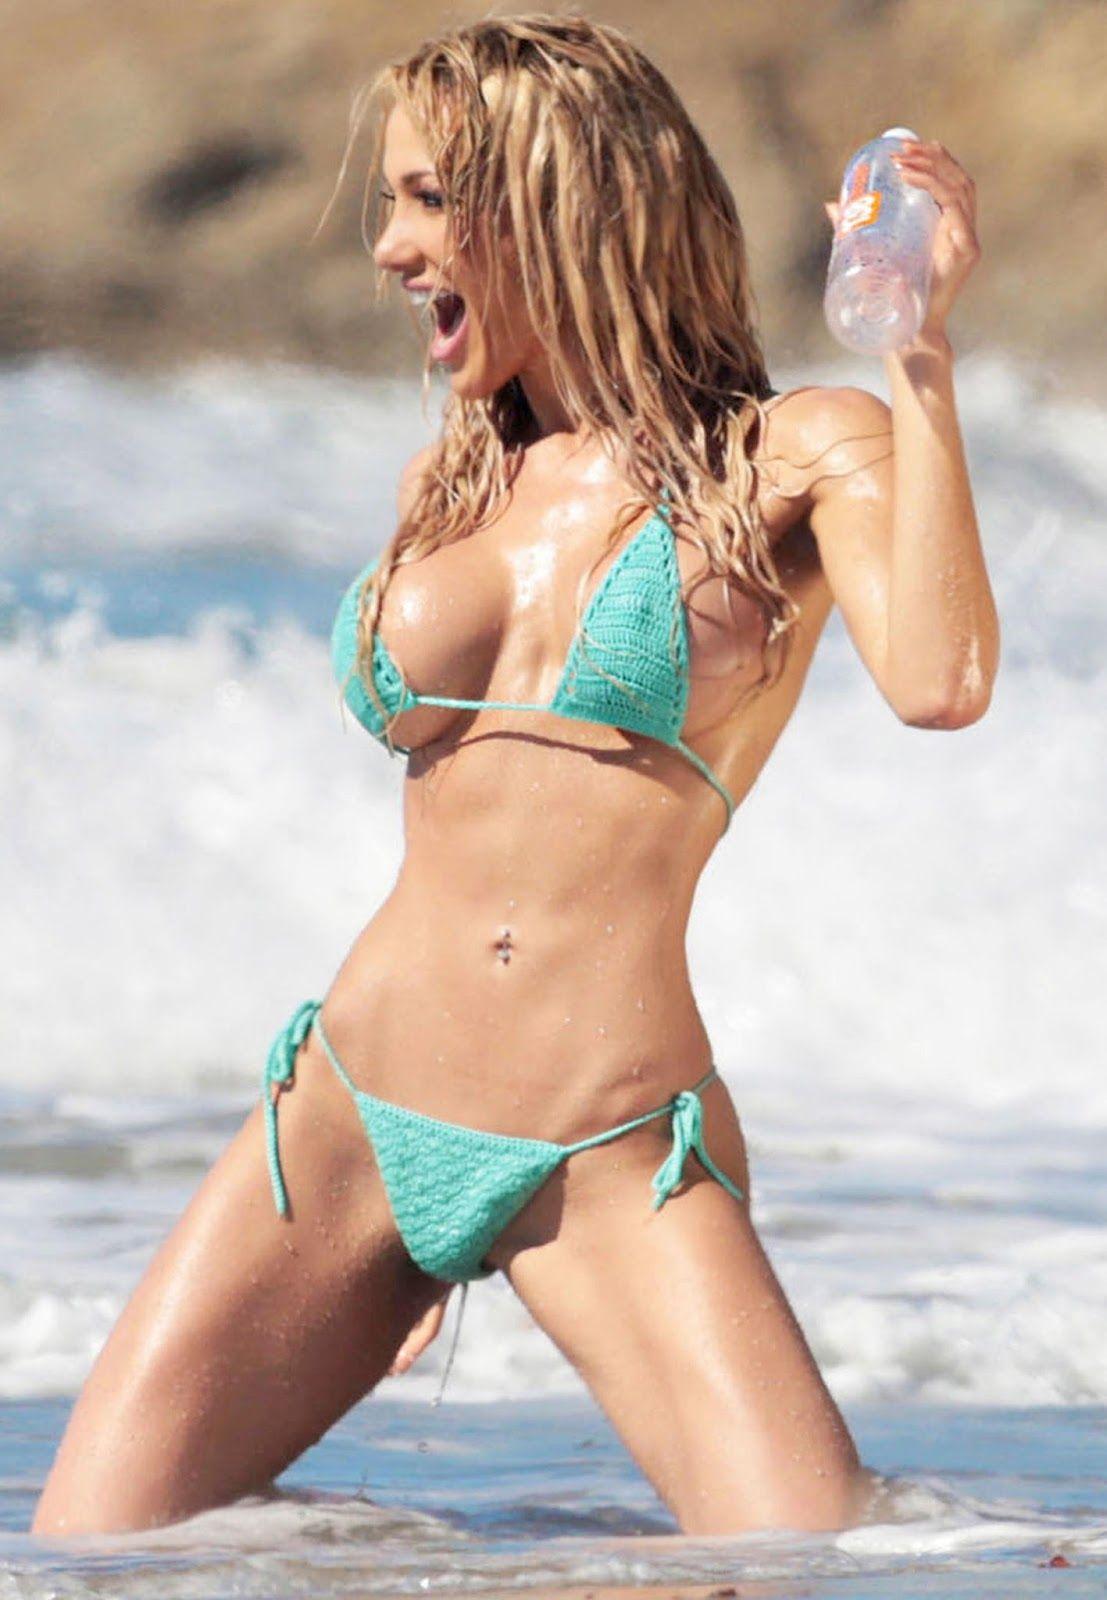 Pictures Dalia Elliott nudes (69 photo), Topless, Paparazzi, Selfie, lingerie 2017